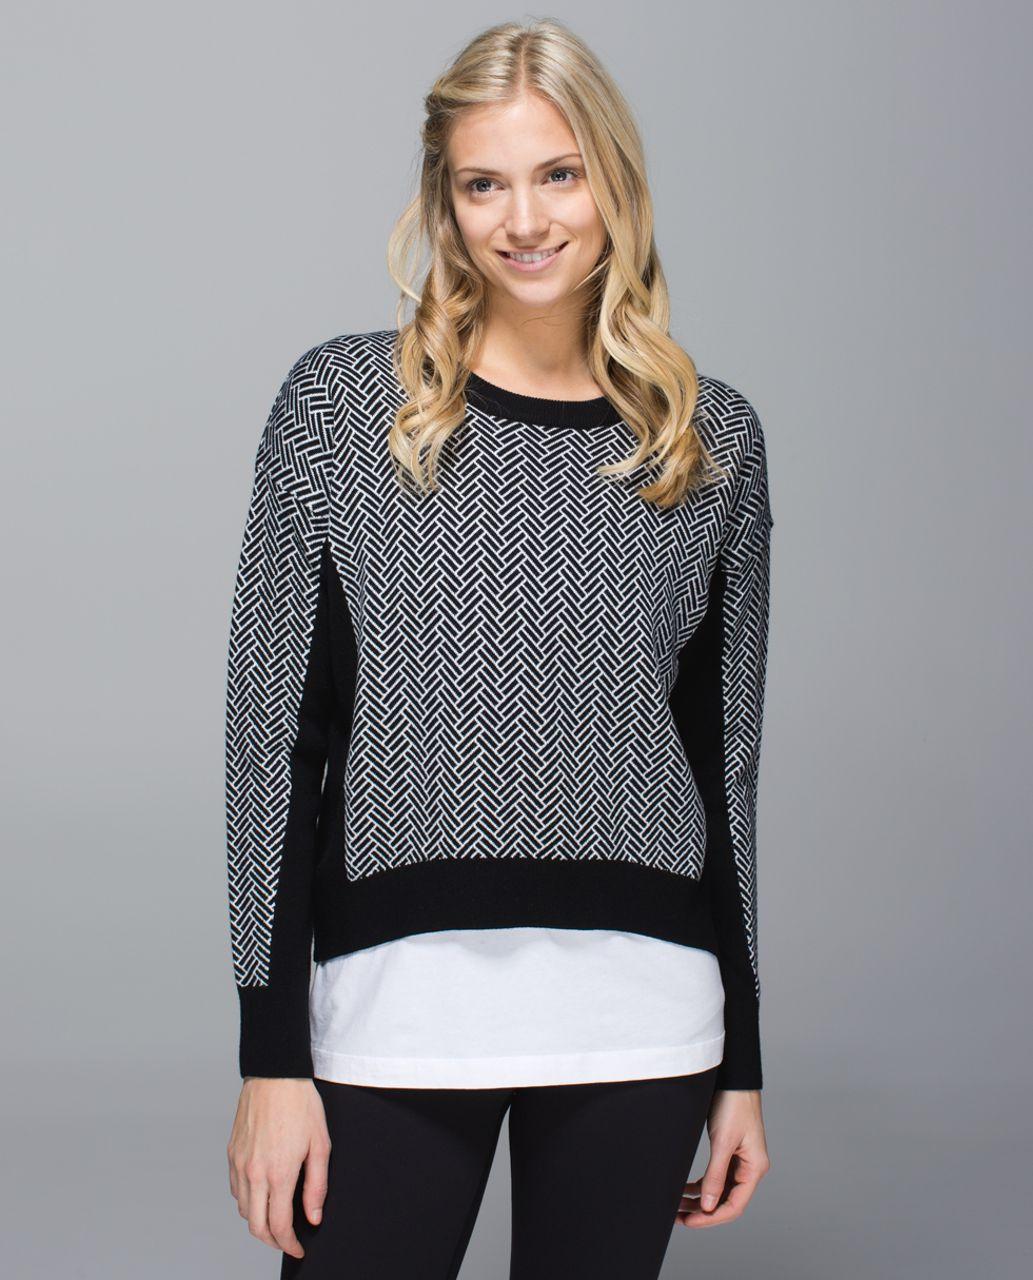 Lululemon Yogi Crew Sweater - Black / White - lulu fanatics